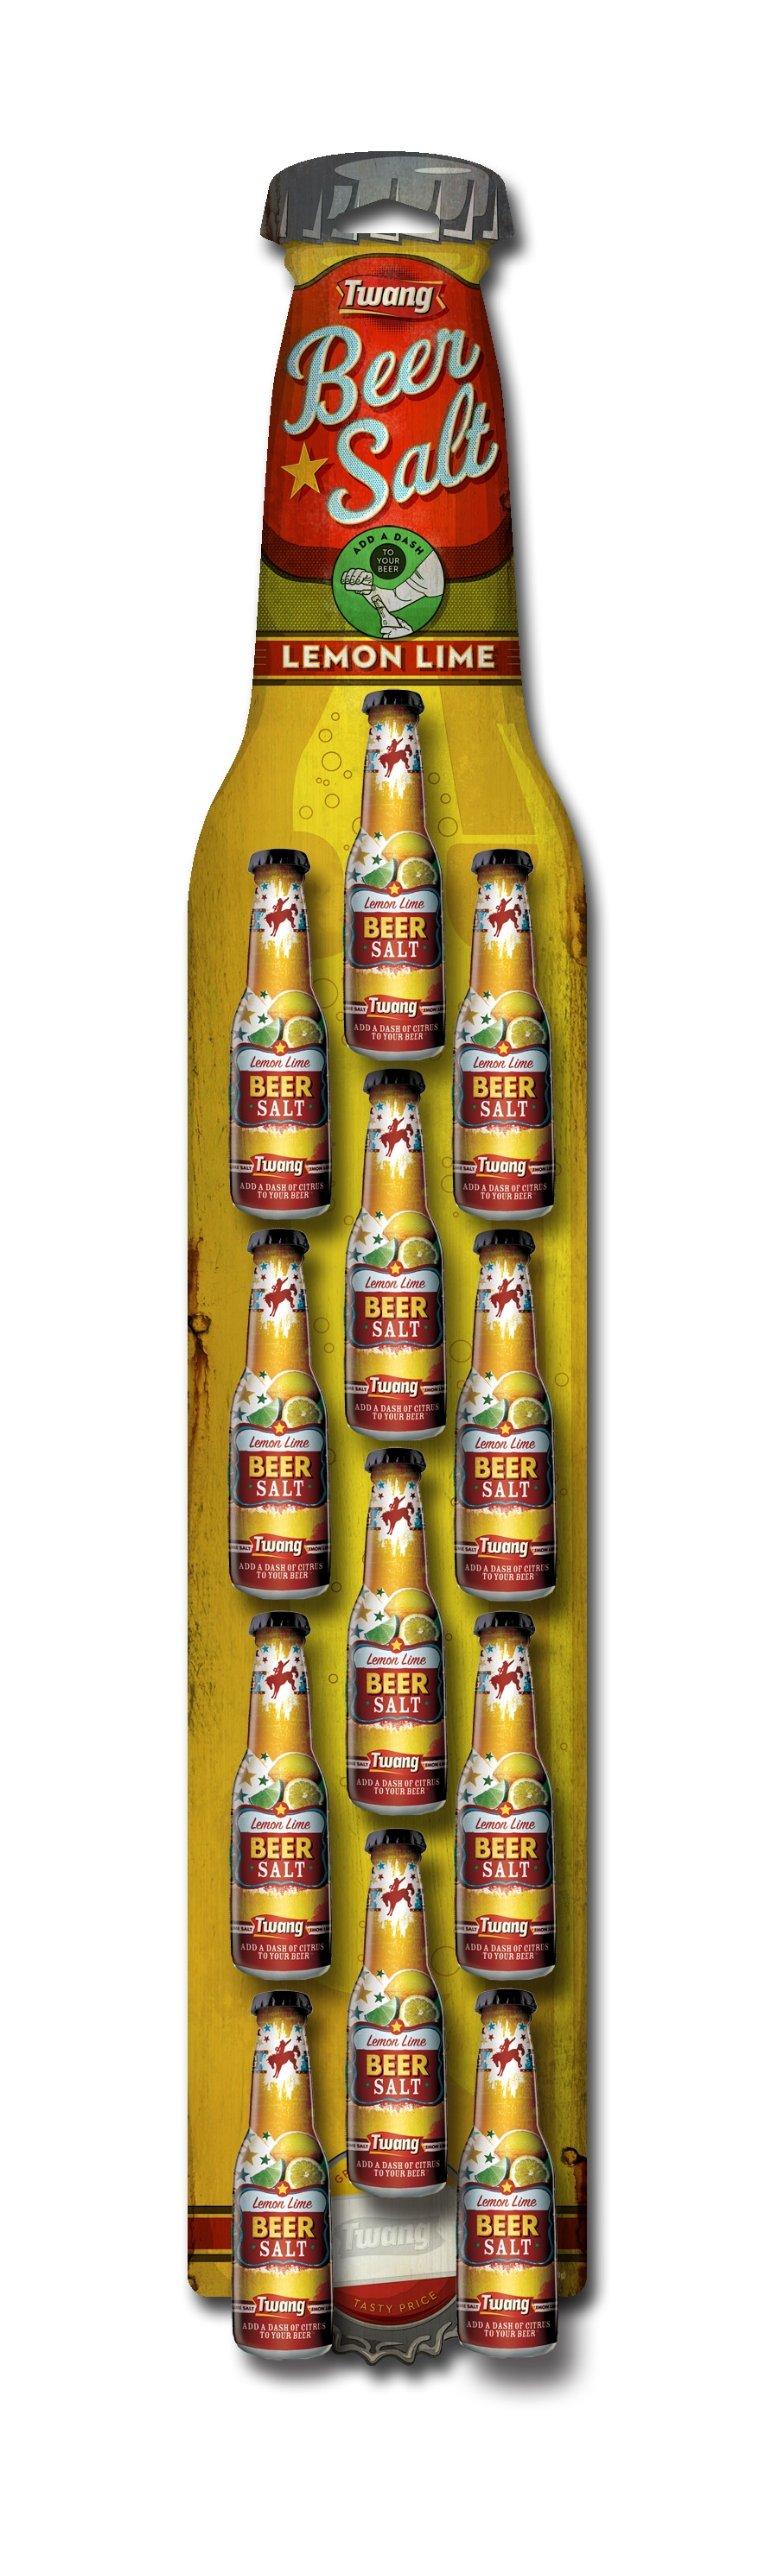 Twang the Original Beer Salt, Lemon-Lime, 1.4-Ounce Bottles (Strip of 12)